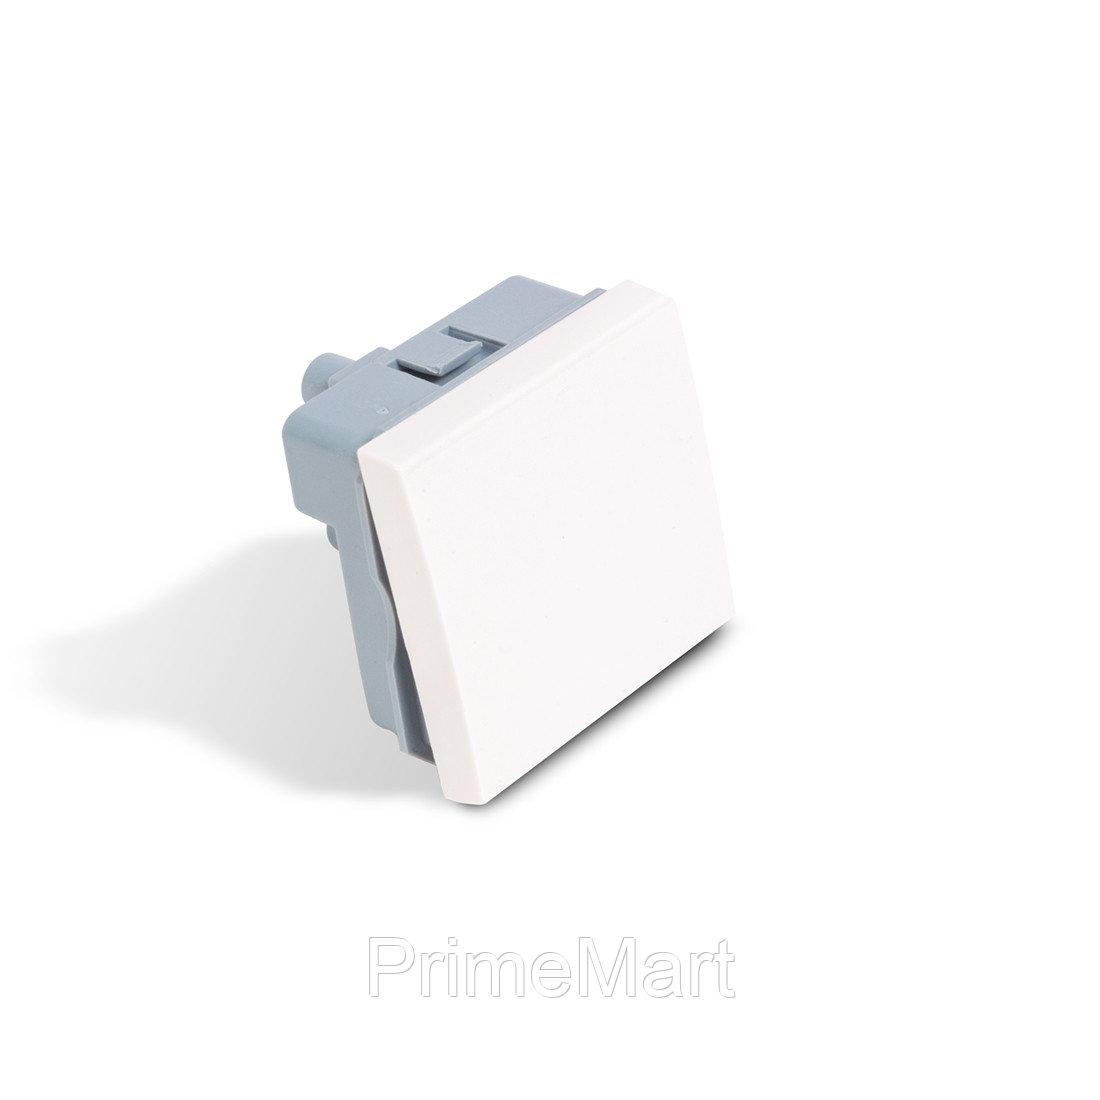 Выключатель одноклавишный Рувинил АДЛ 13-904 45х45 мм белый АДЛ 13-904